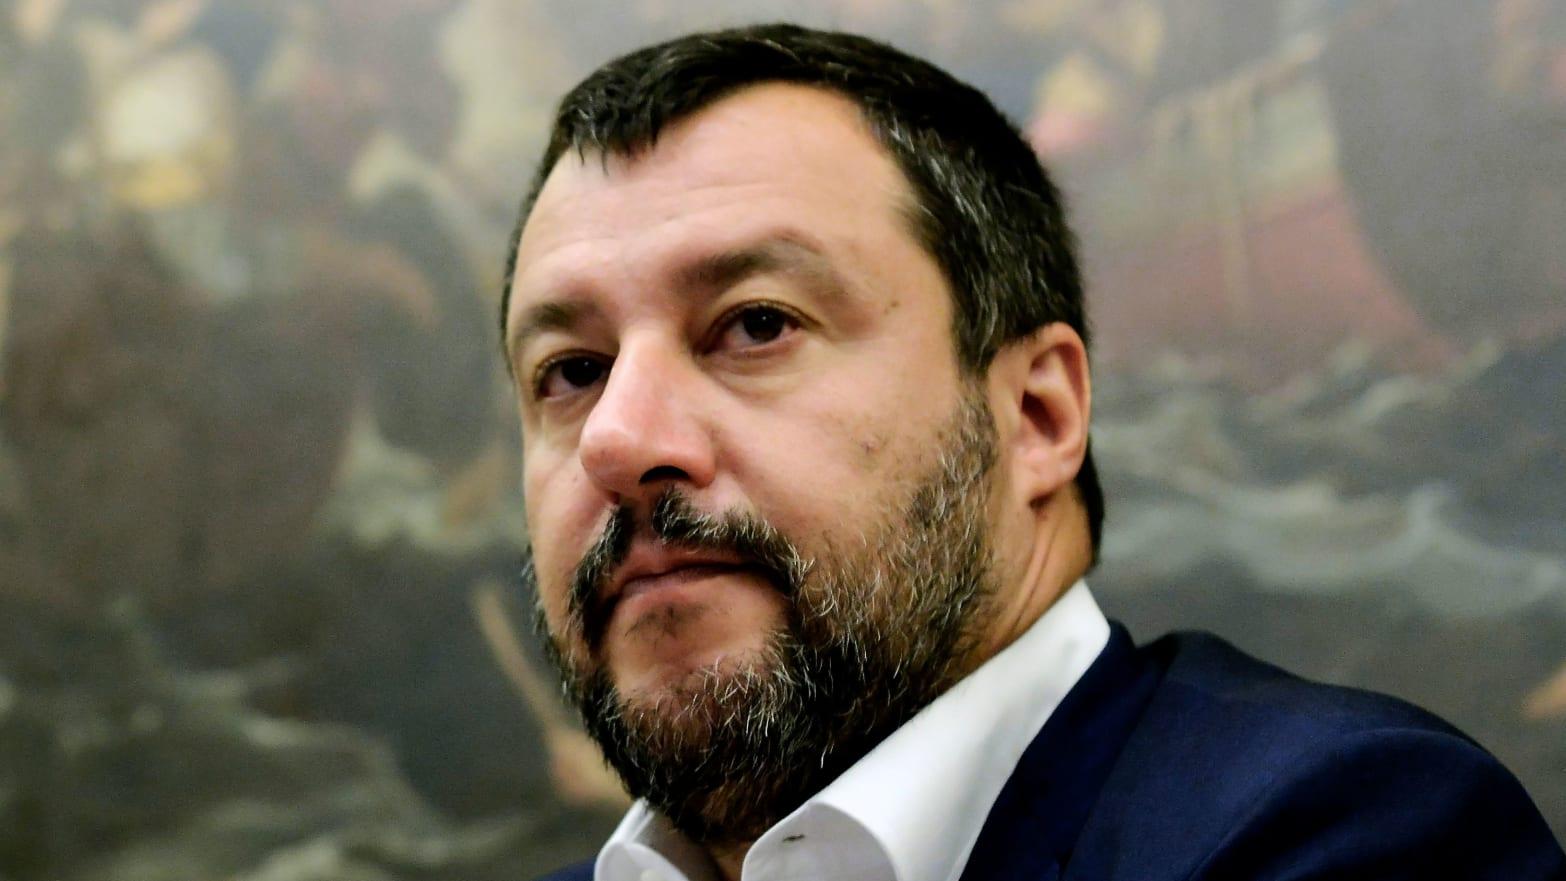 Steve Bannon's Populist Dream Shattered By Matteo Salvini's Power Play